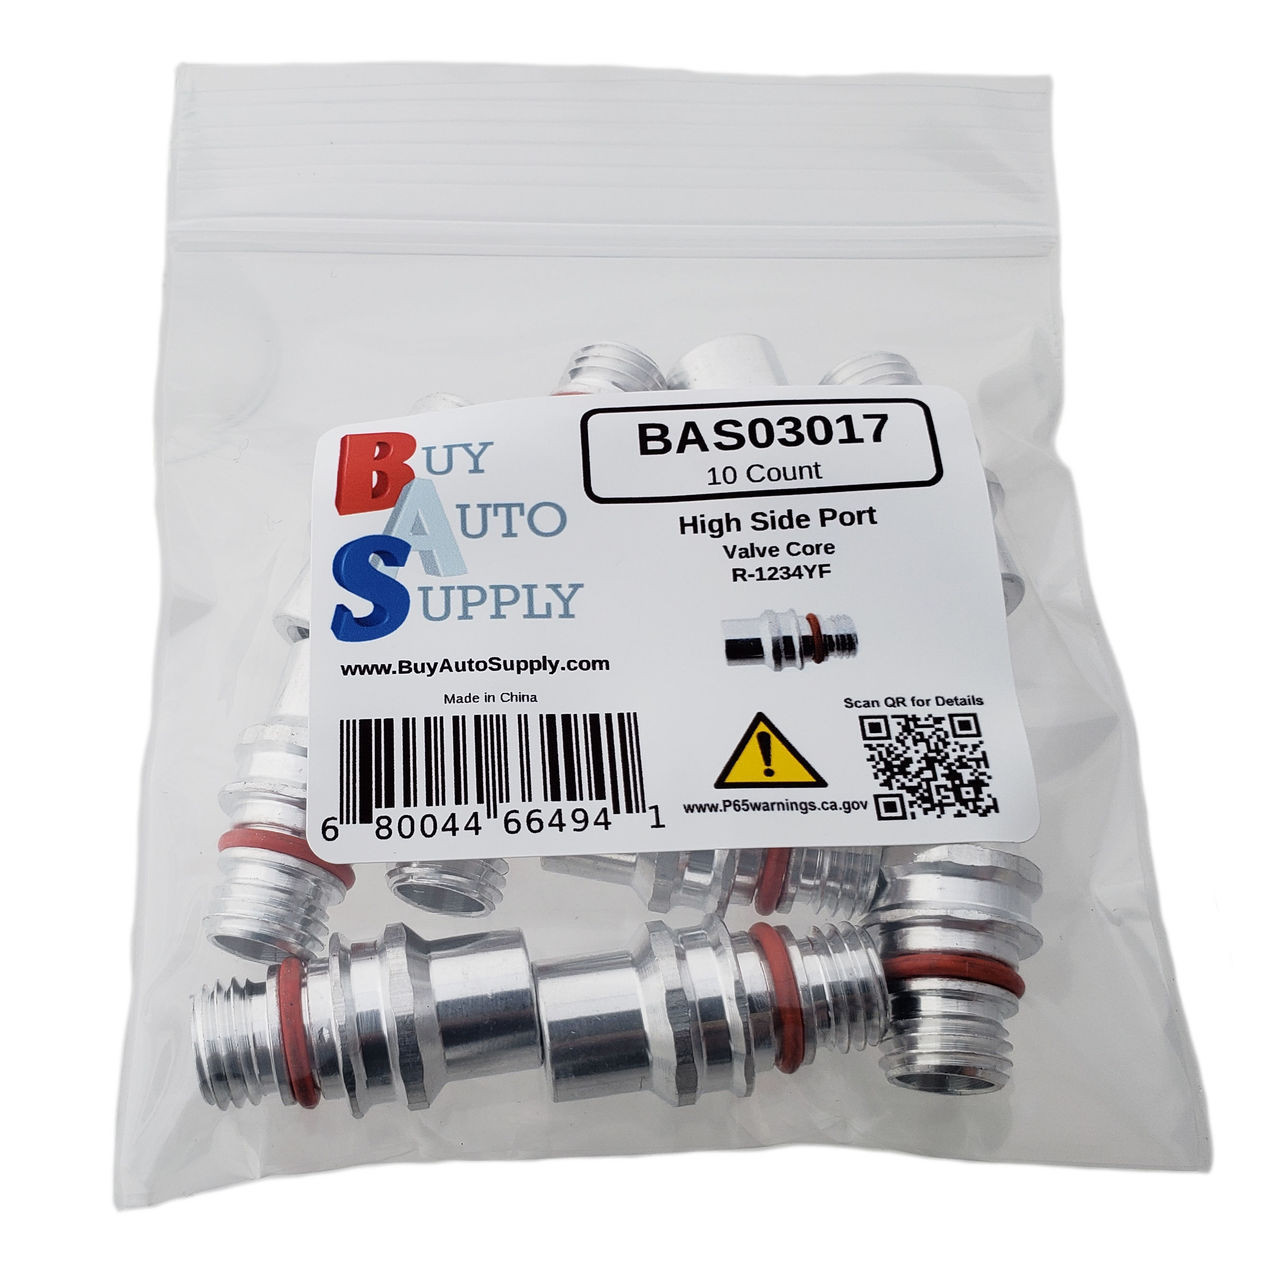 BAS03017 - 1234YF High Side Port Valve